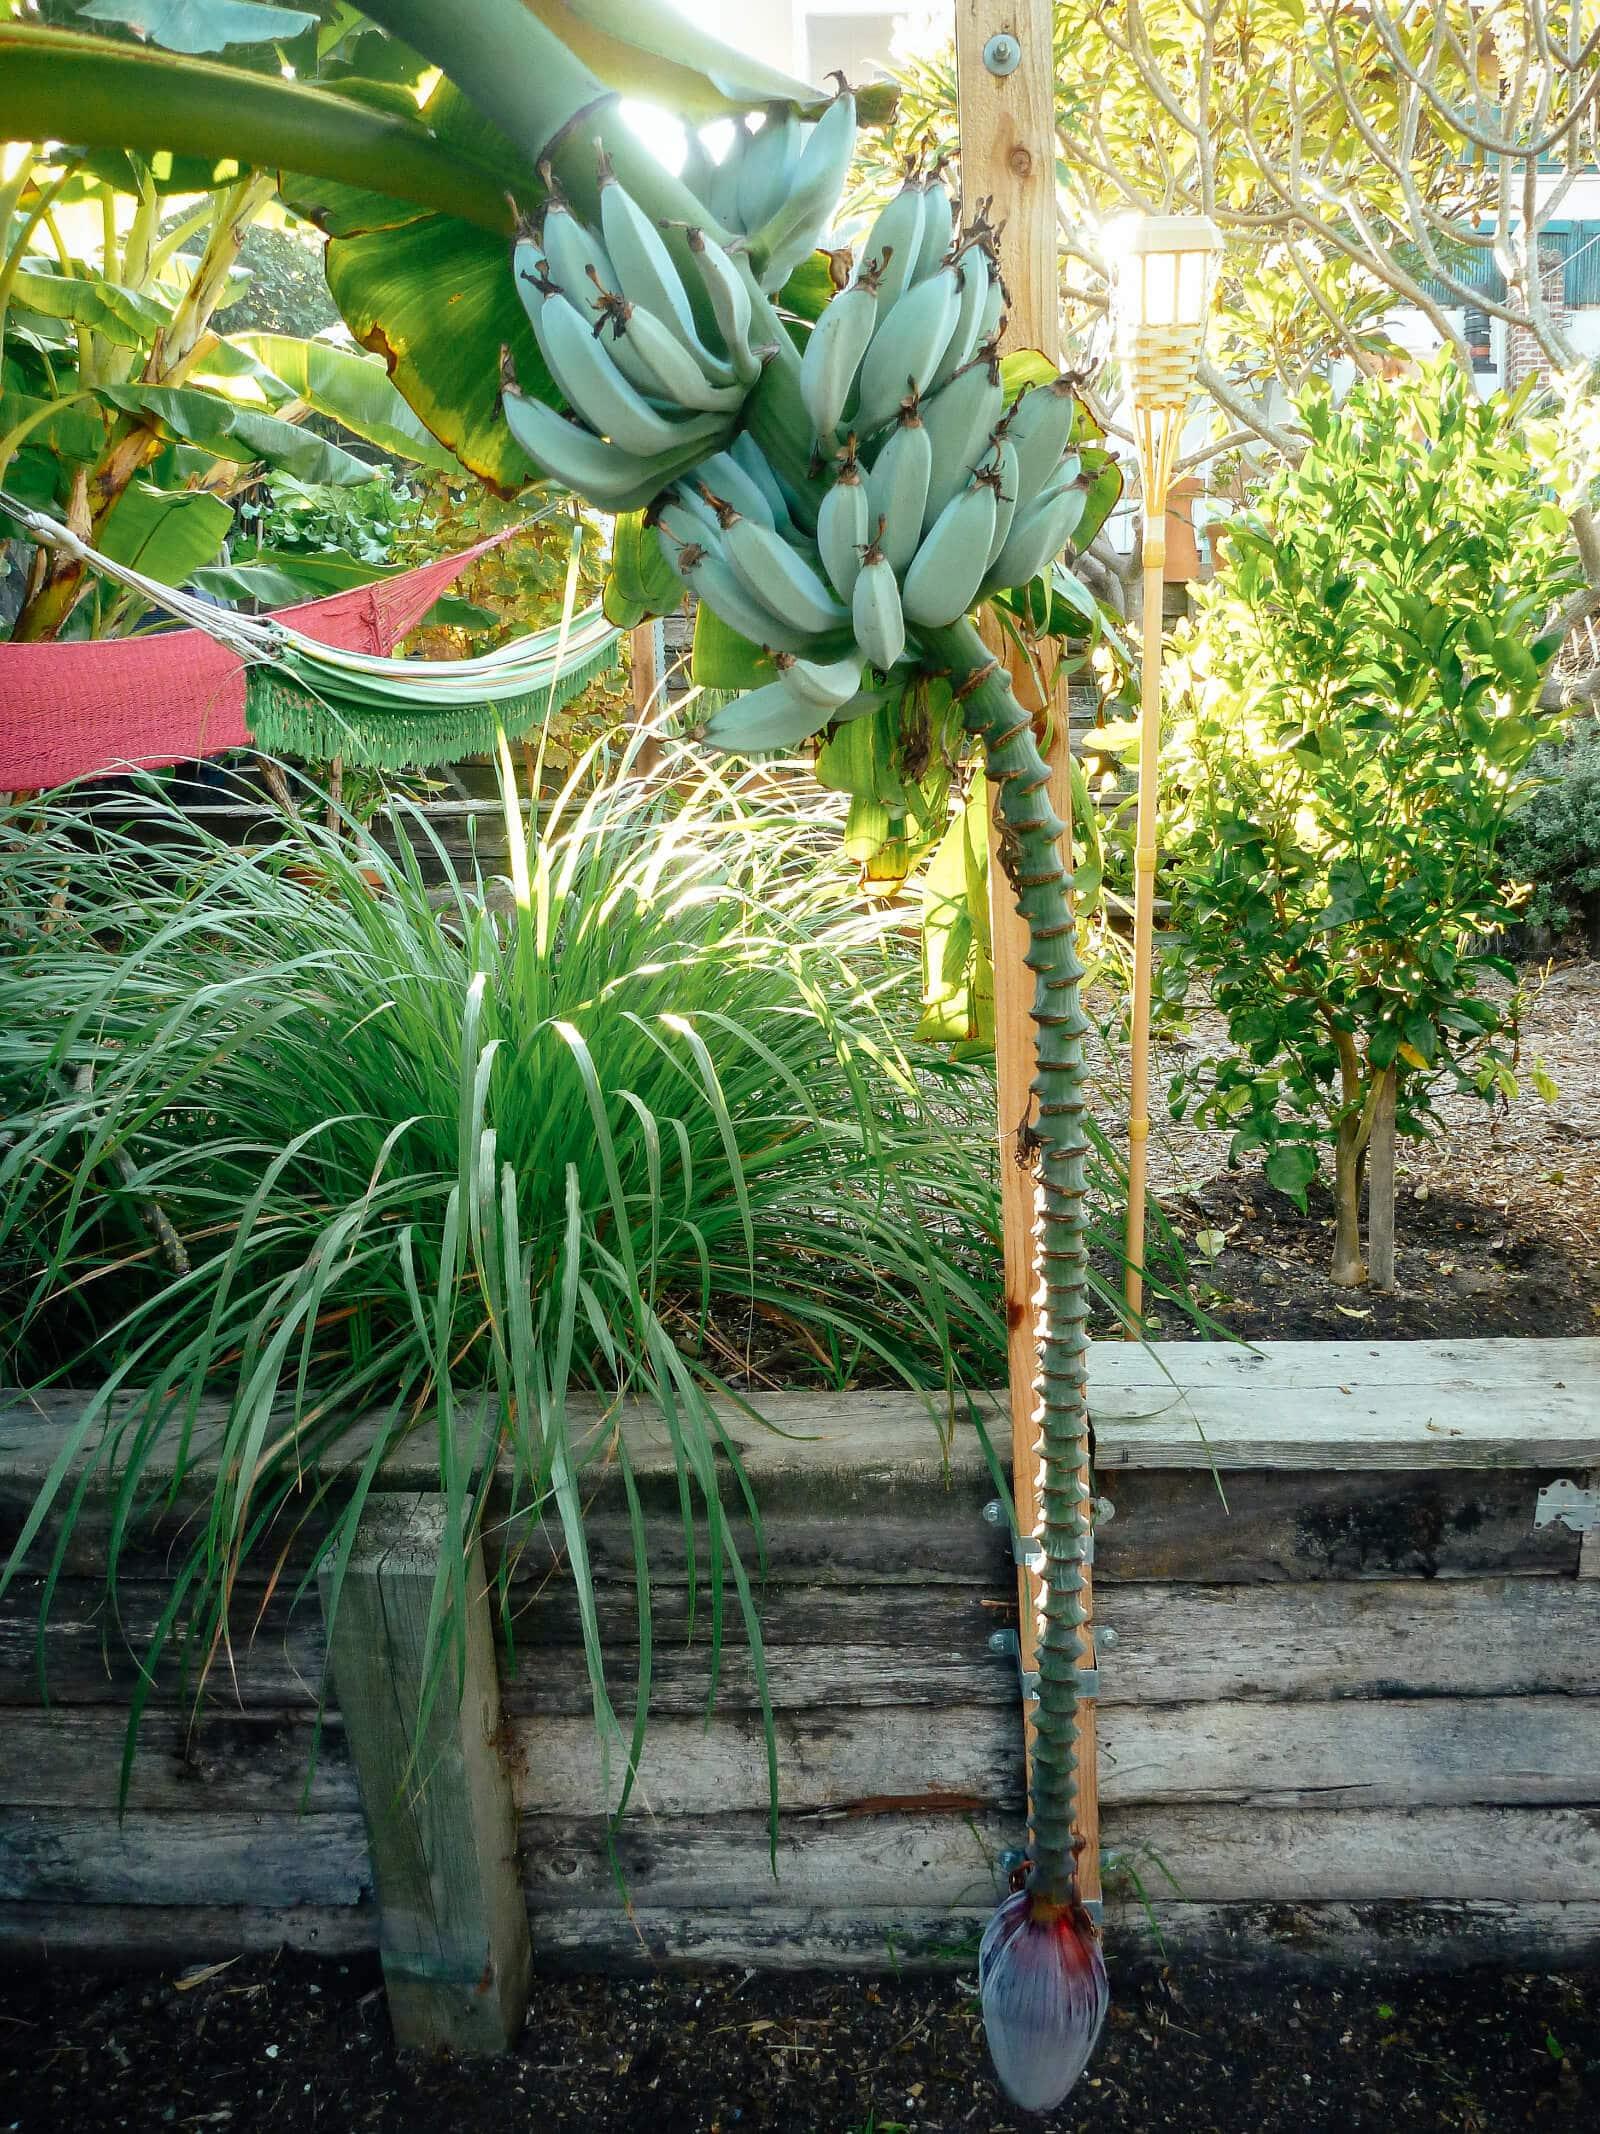 A long rachis on a banana plant